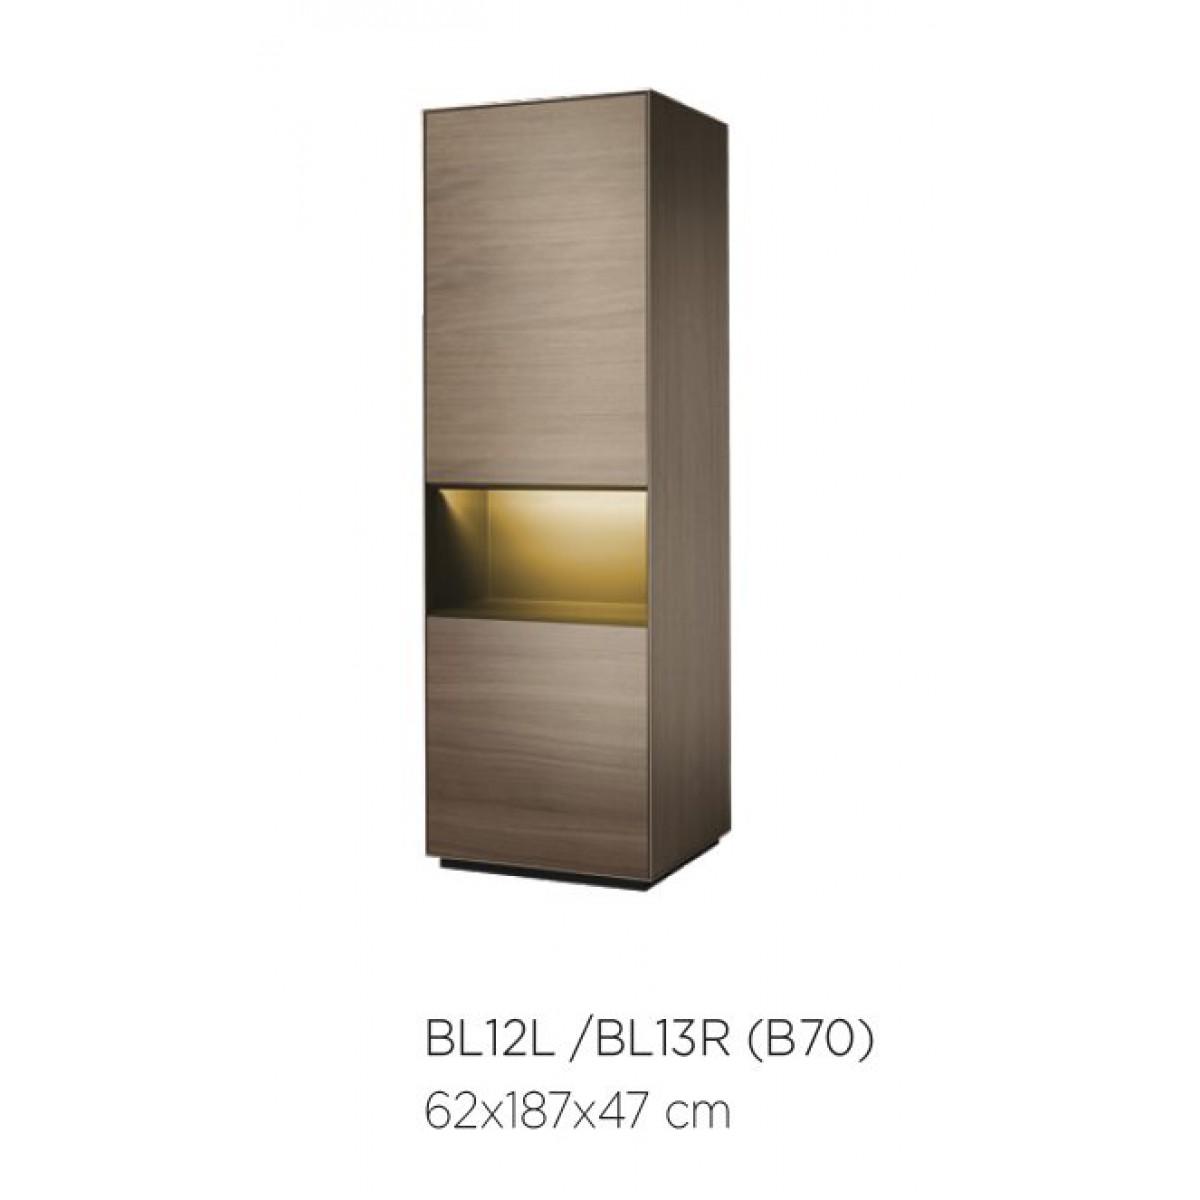 bergkast-buffet-bloom-eiken-BL12L-miltonhouse-plint-links